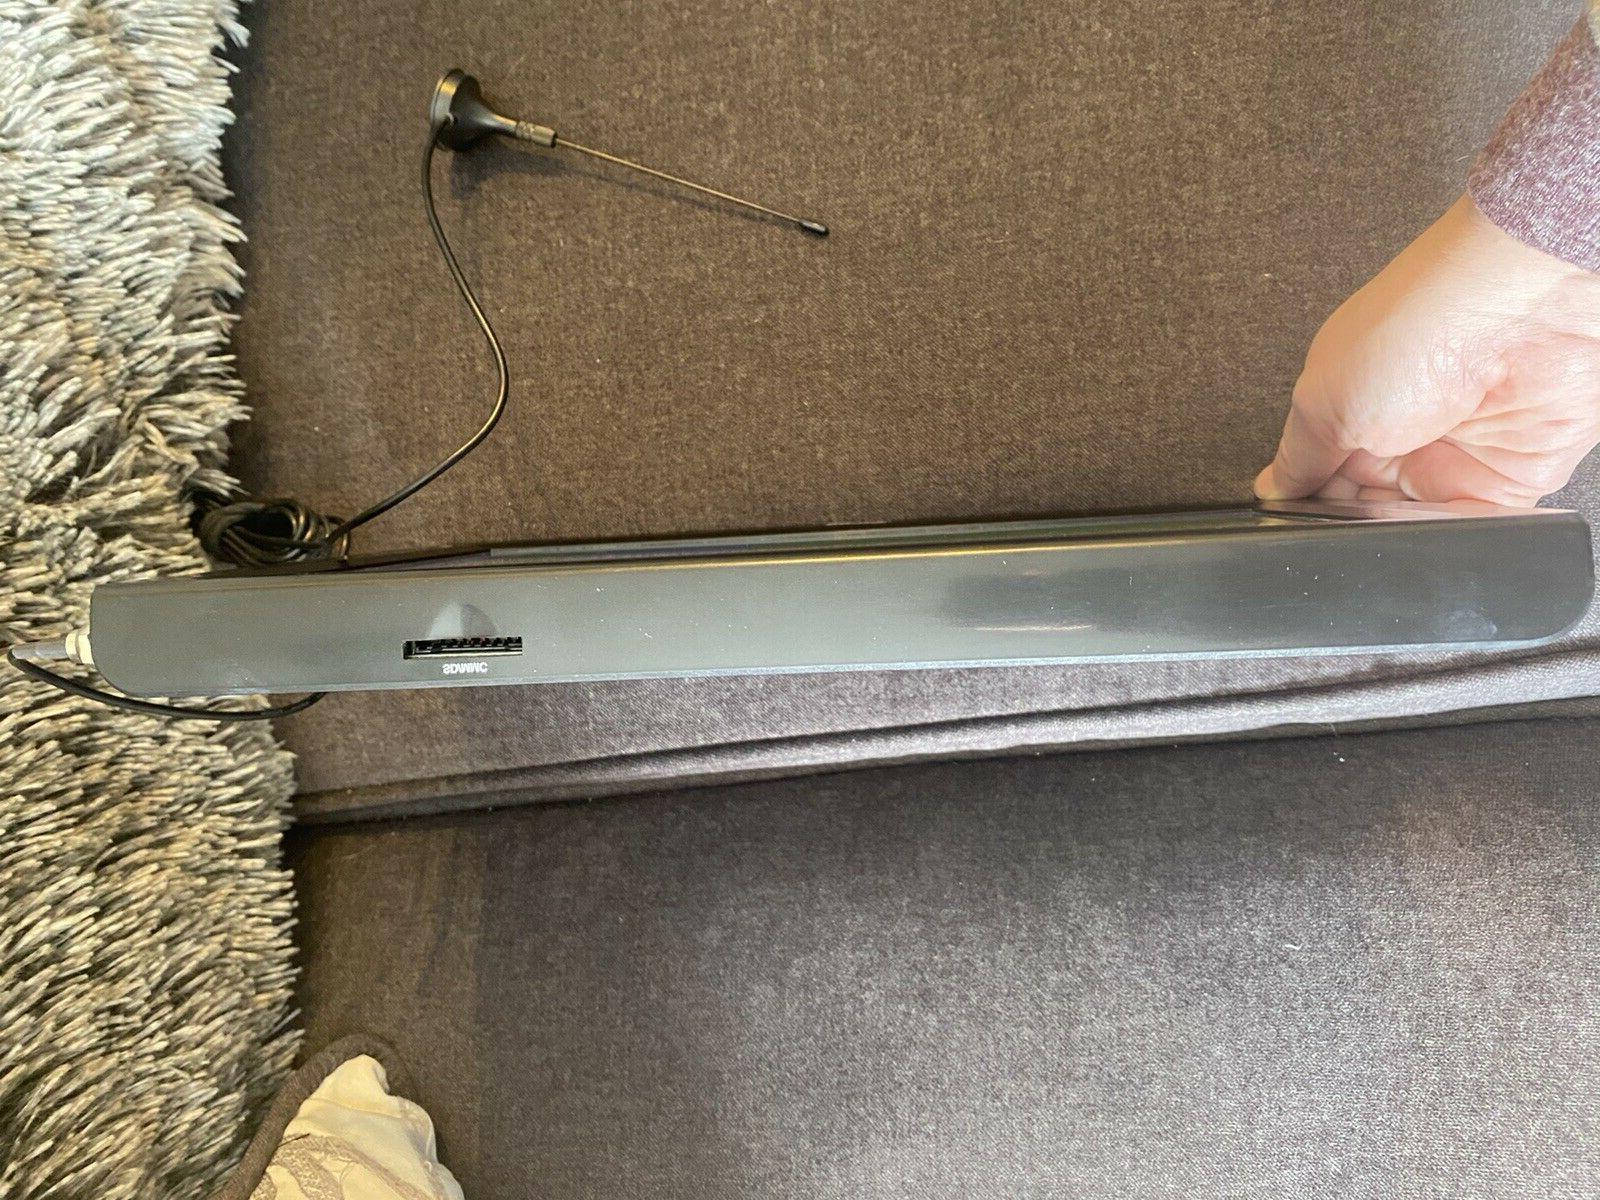 Supersonic 1280p Portable